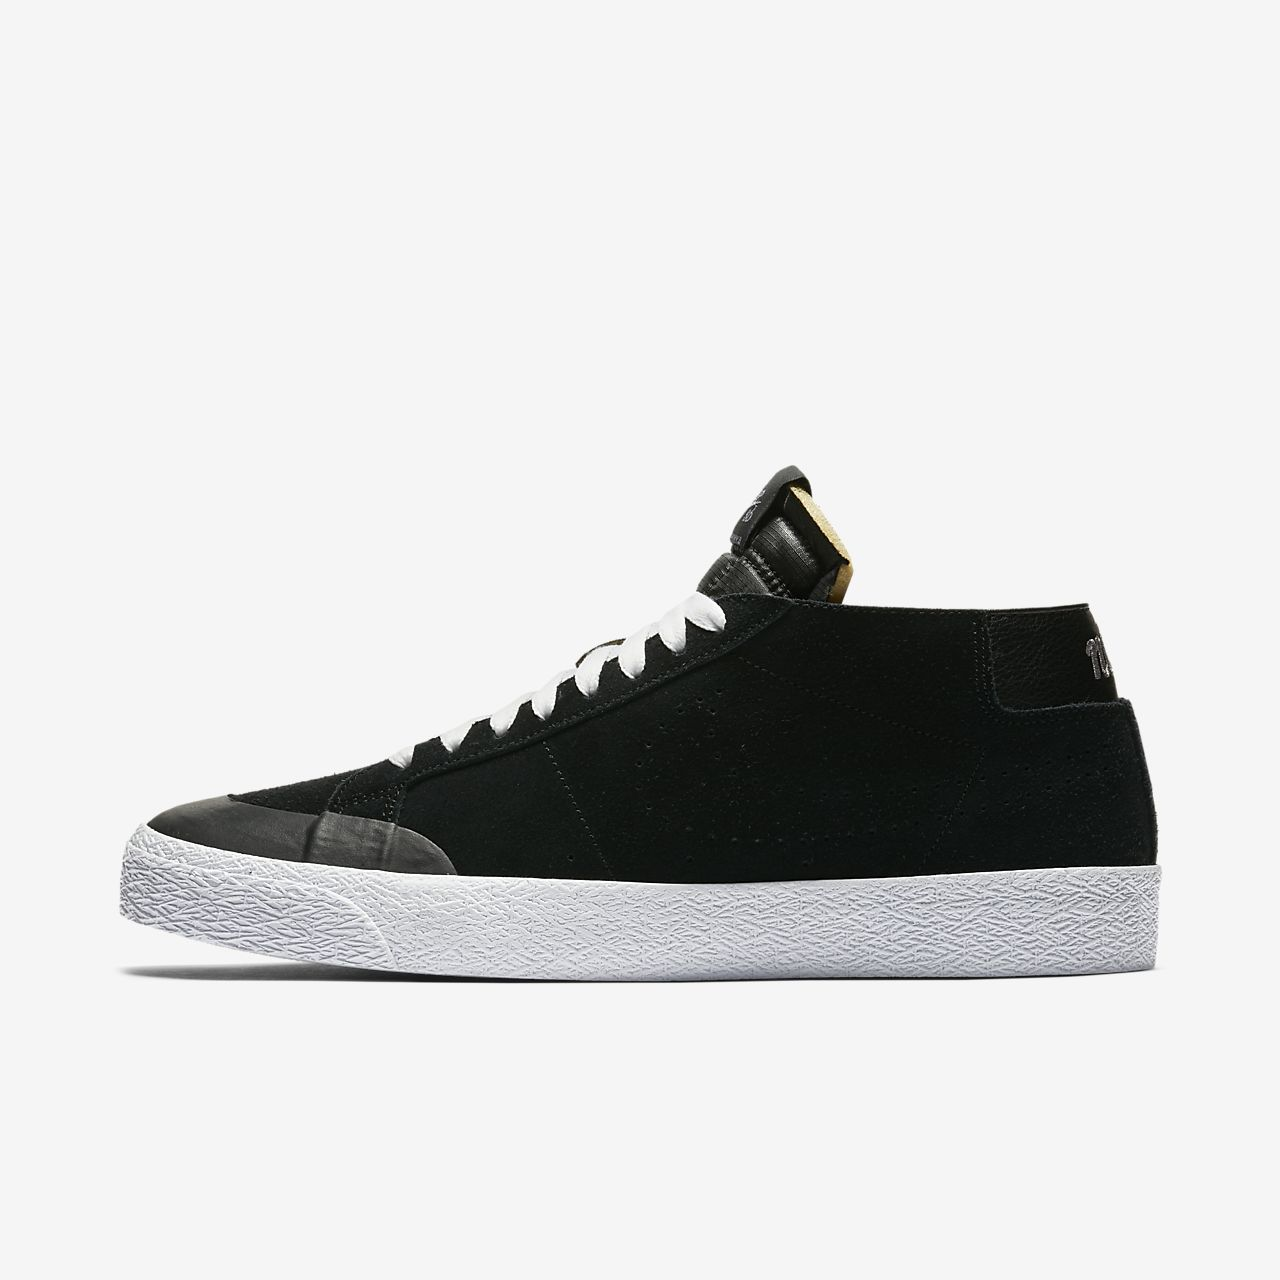 buy online d237c 7a739 ... Nike SB Zoom Blazer Chukka XT Mens Skateboarding Shoe